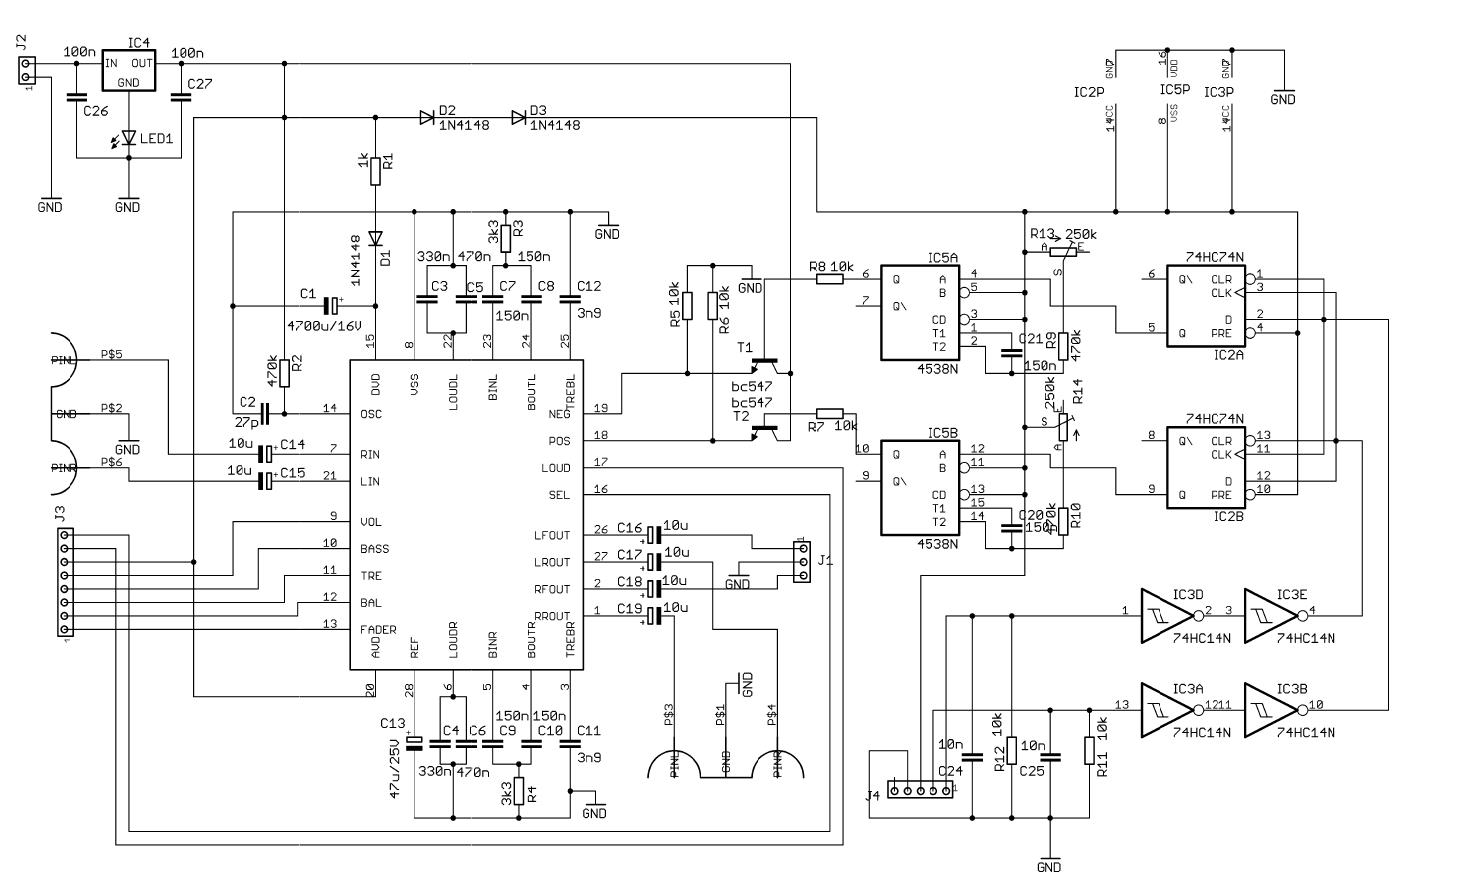 PT2317B Digital Preamp Circuit - Electronics Projects Circuits on digital electronics, circuit artwork, circuit symbols, circuit formulas, block diagram, one-line diagram, circuit blueprints, circuit diagrams, integrated circuit layout, network analysis, circuit design, function block diagram, wiring diagram,